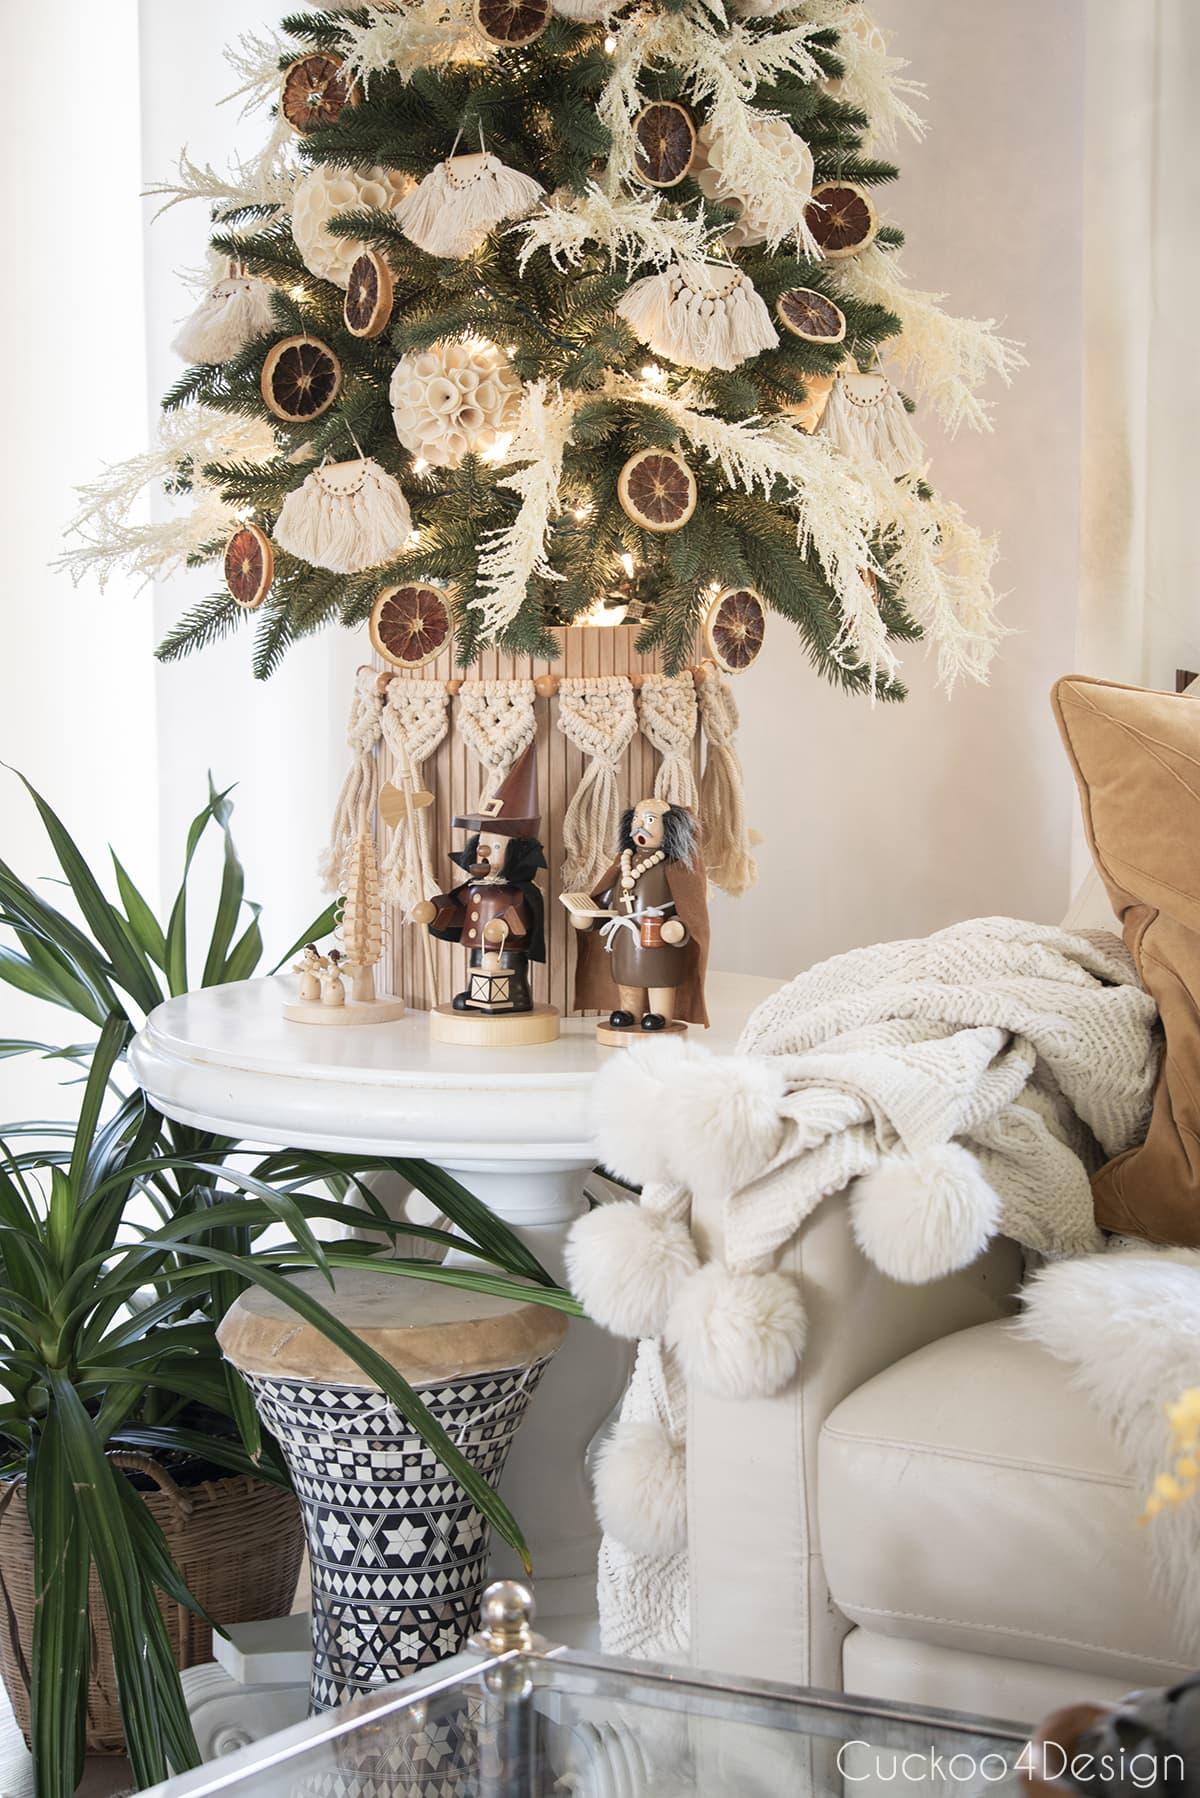 closeup of macrame garland around boho Christmas tree